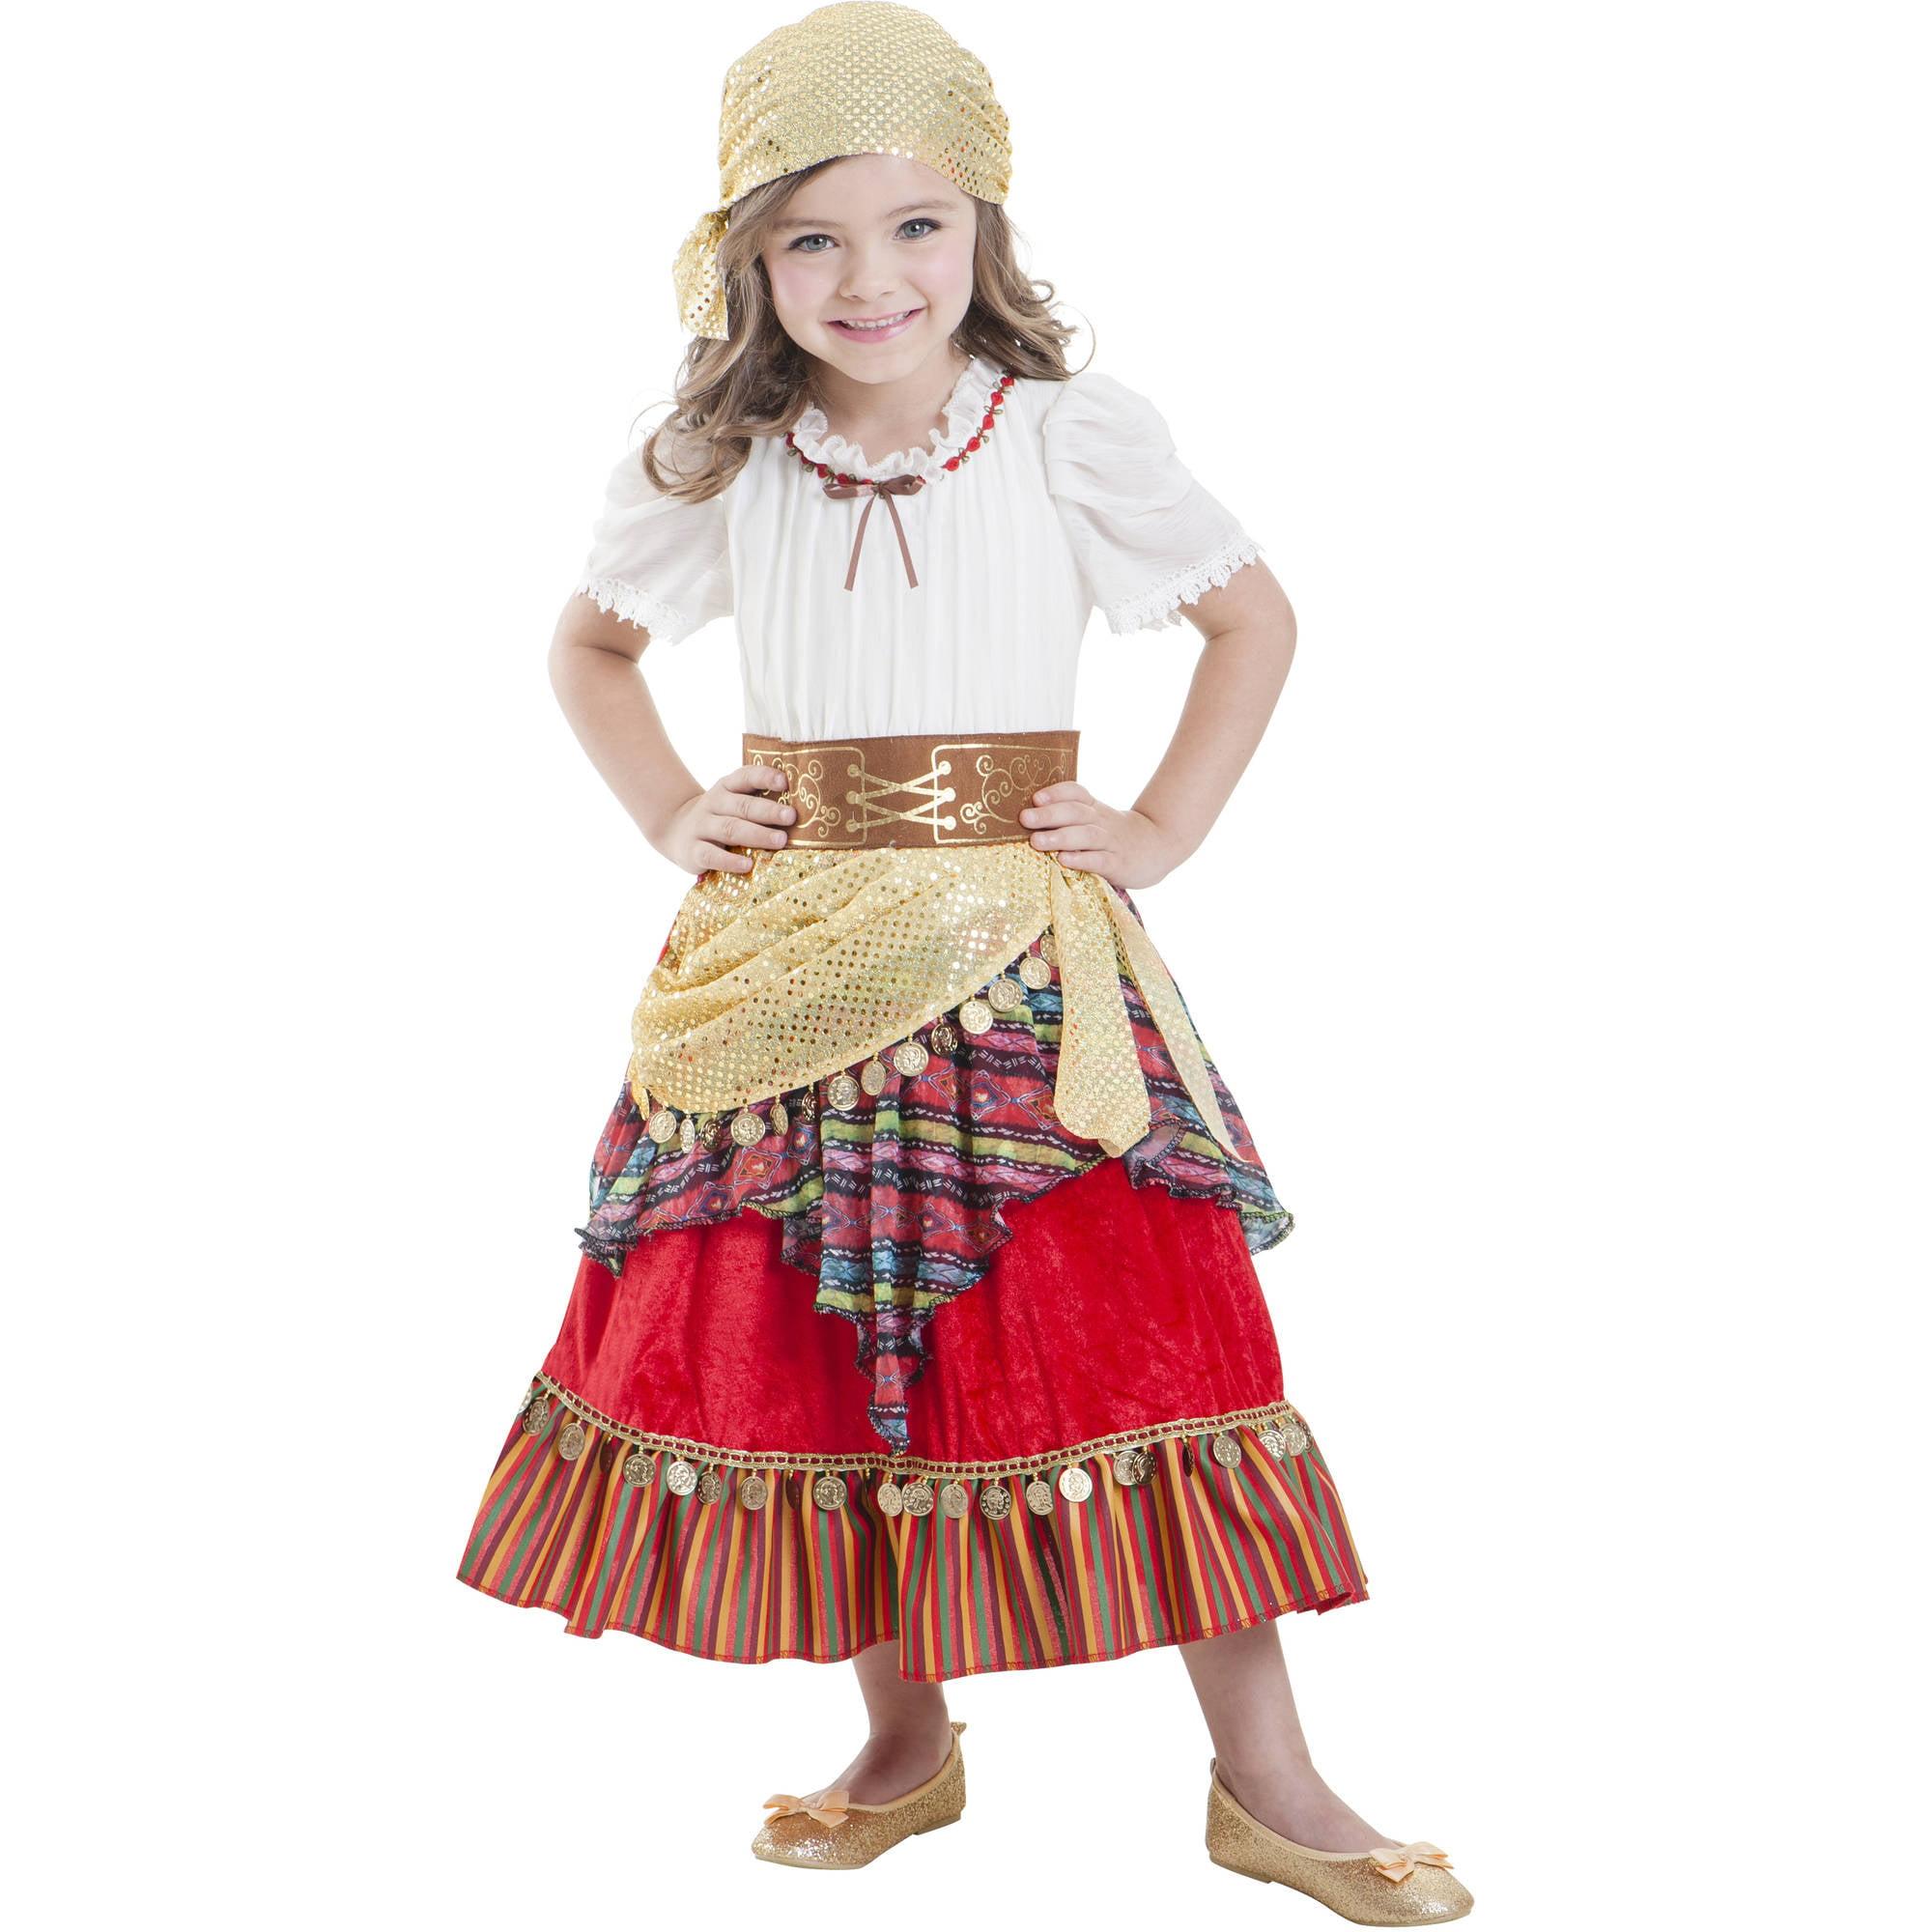 sc 1 st  Walmart & Gypsy Cutie Child Halloween Costume - Walmart.com